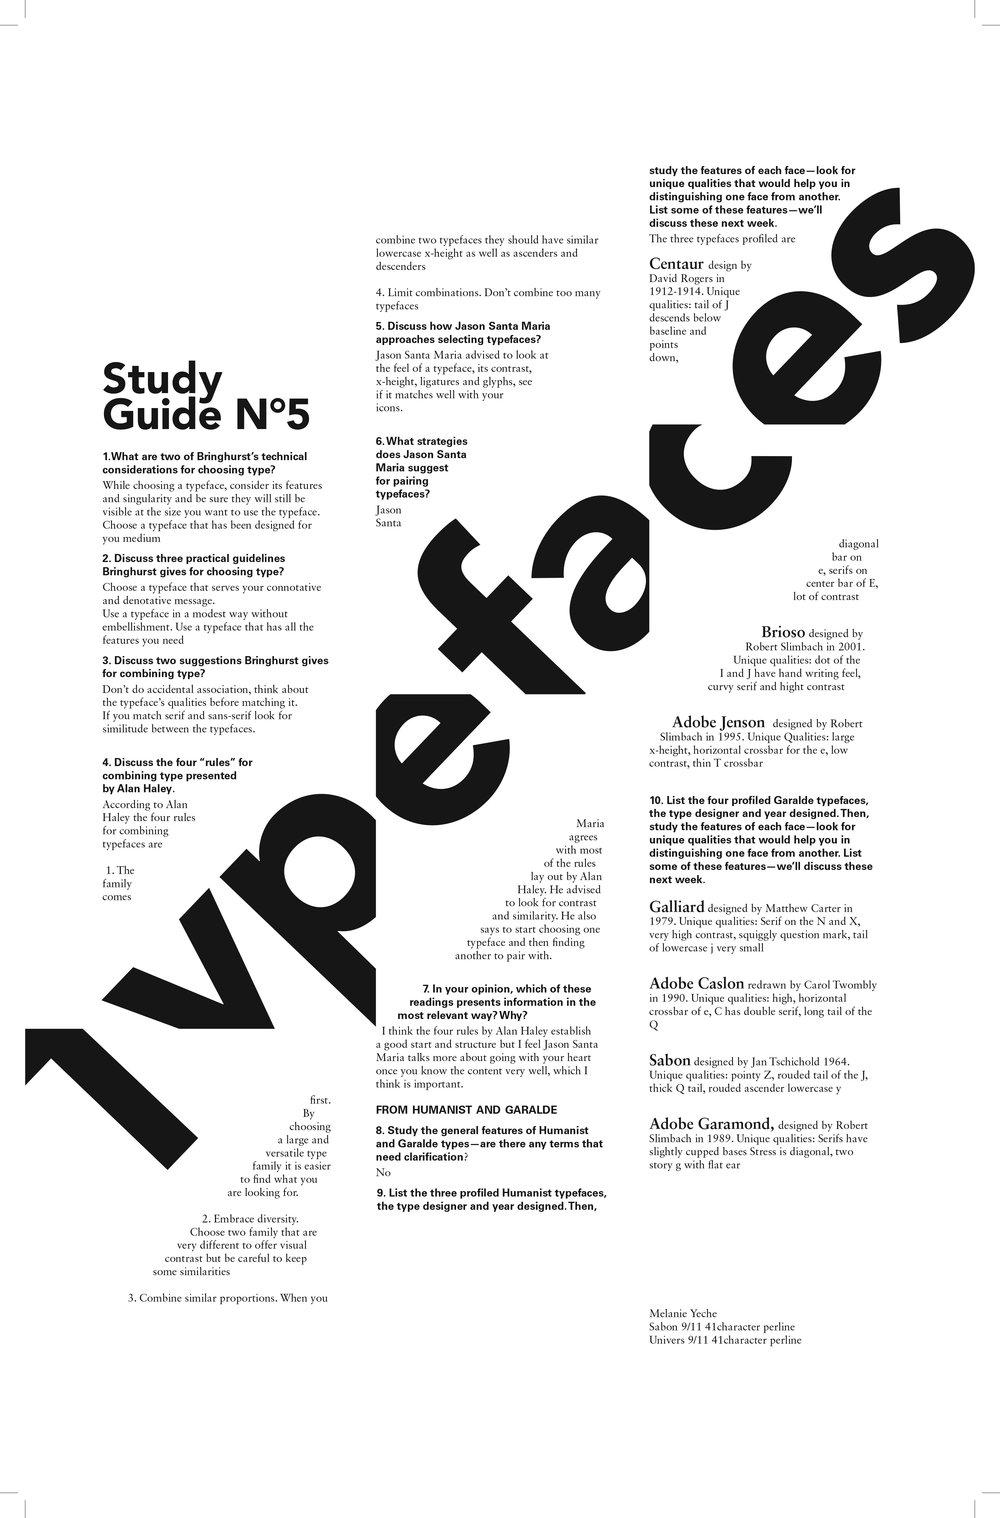 study_guide6.jpg